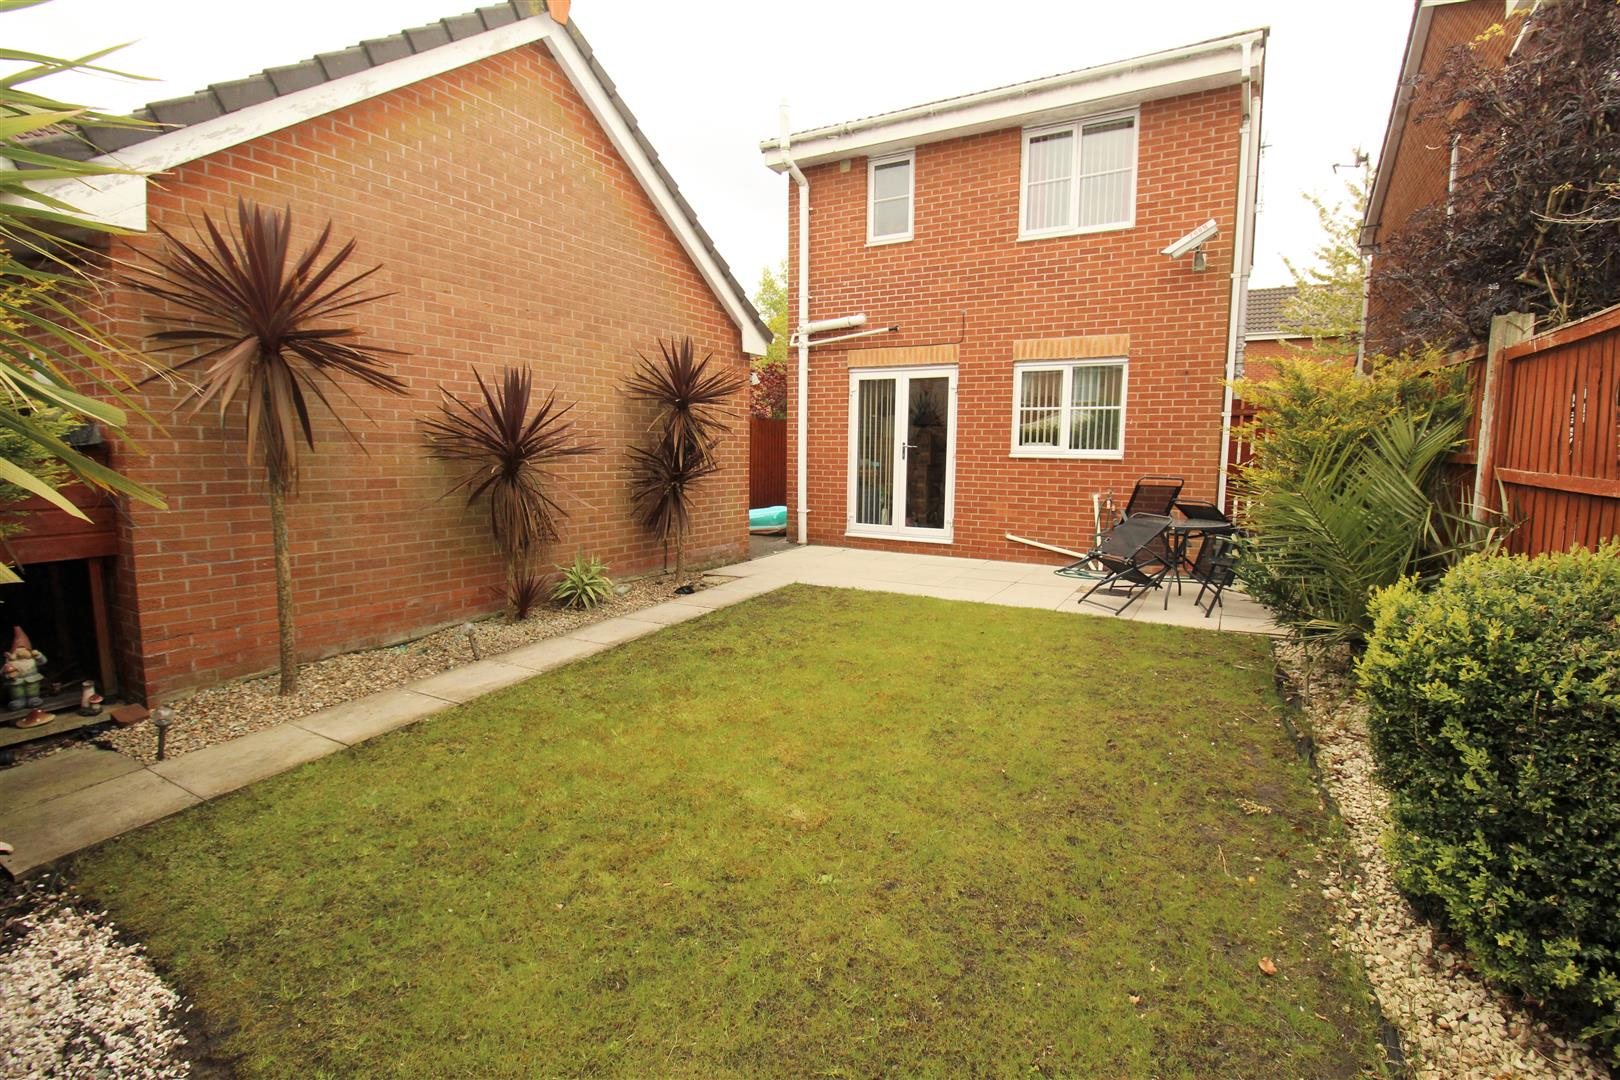 3 Bedrooms, House - Detached, Hexham Close, Liverpool